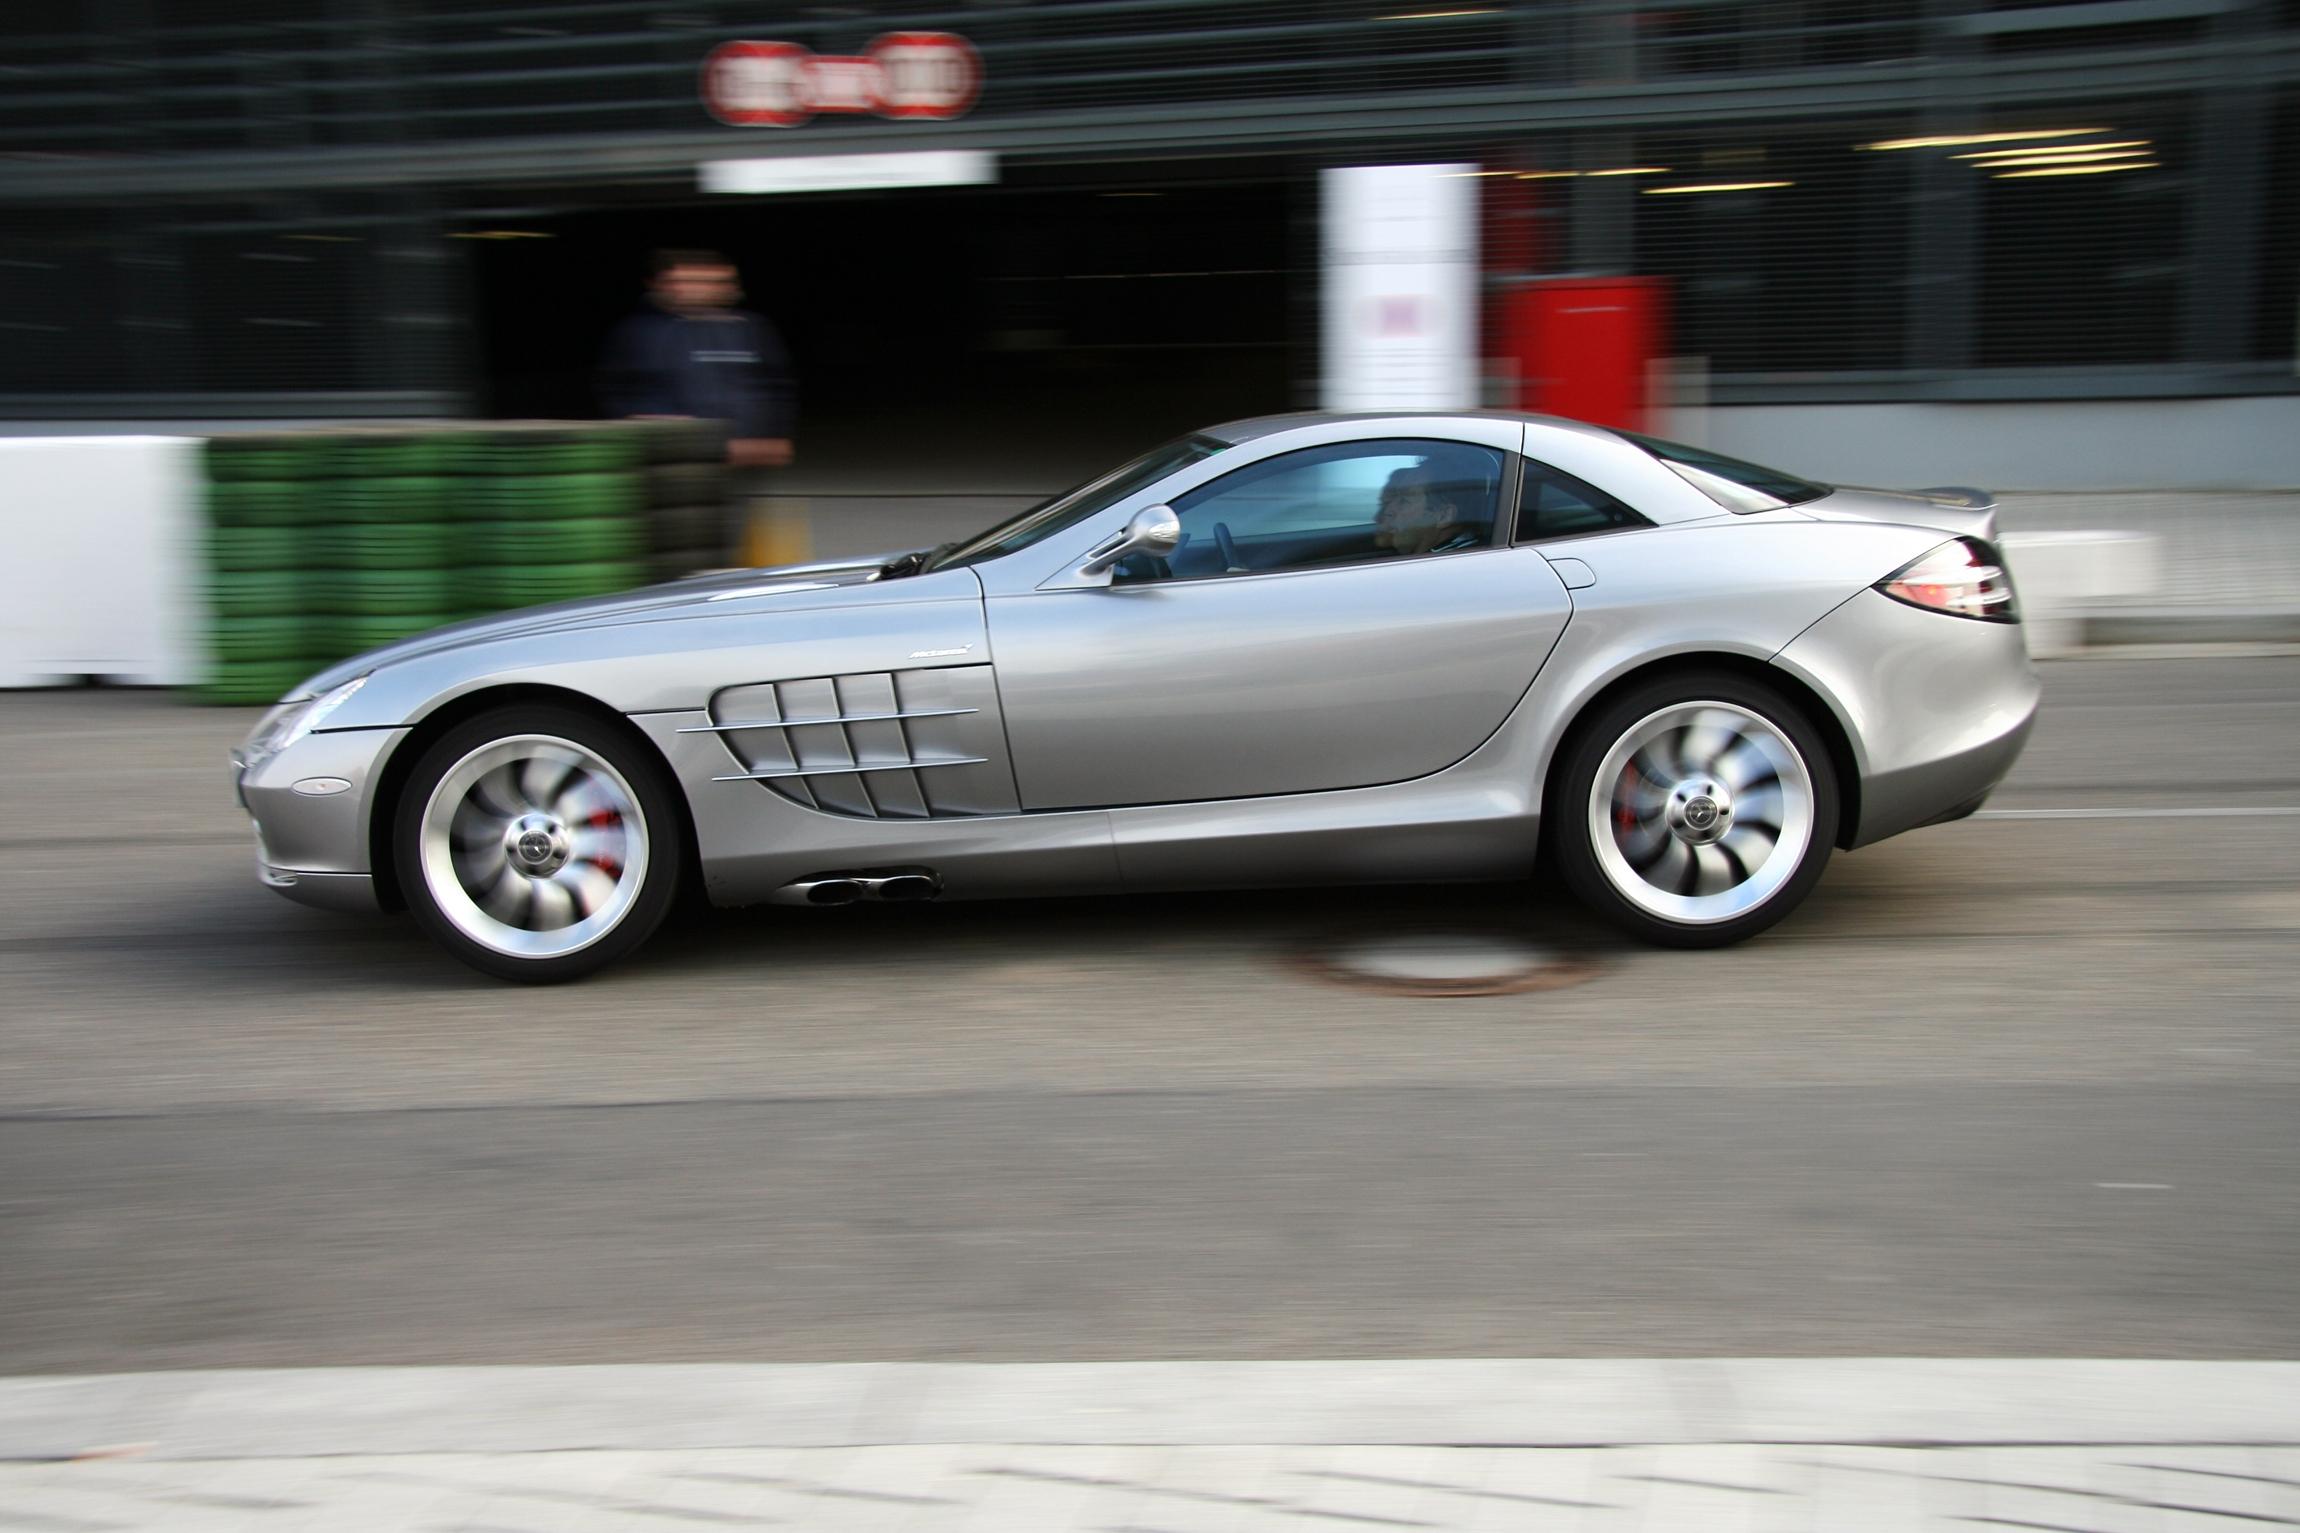 Mercedes Amg Slr